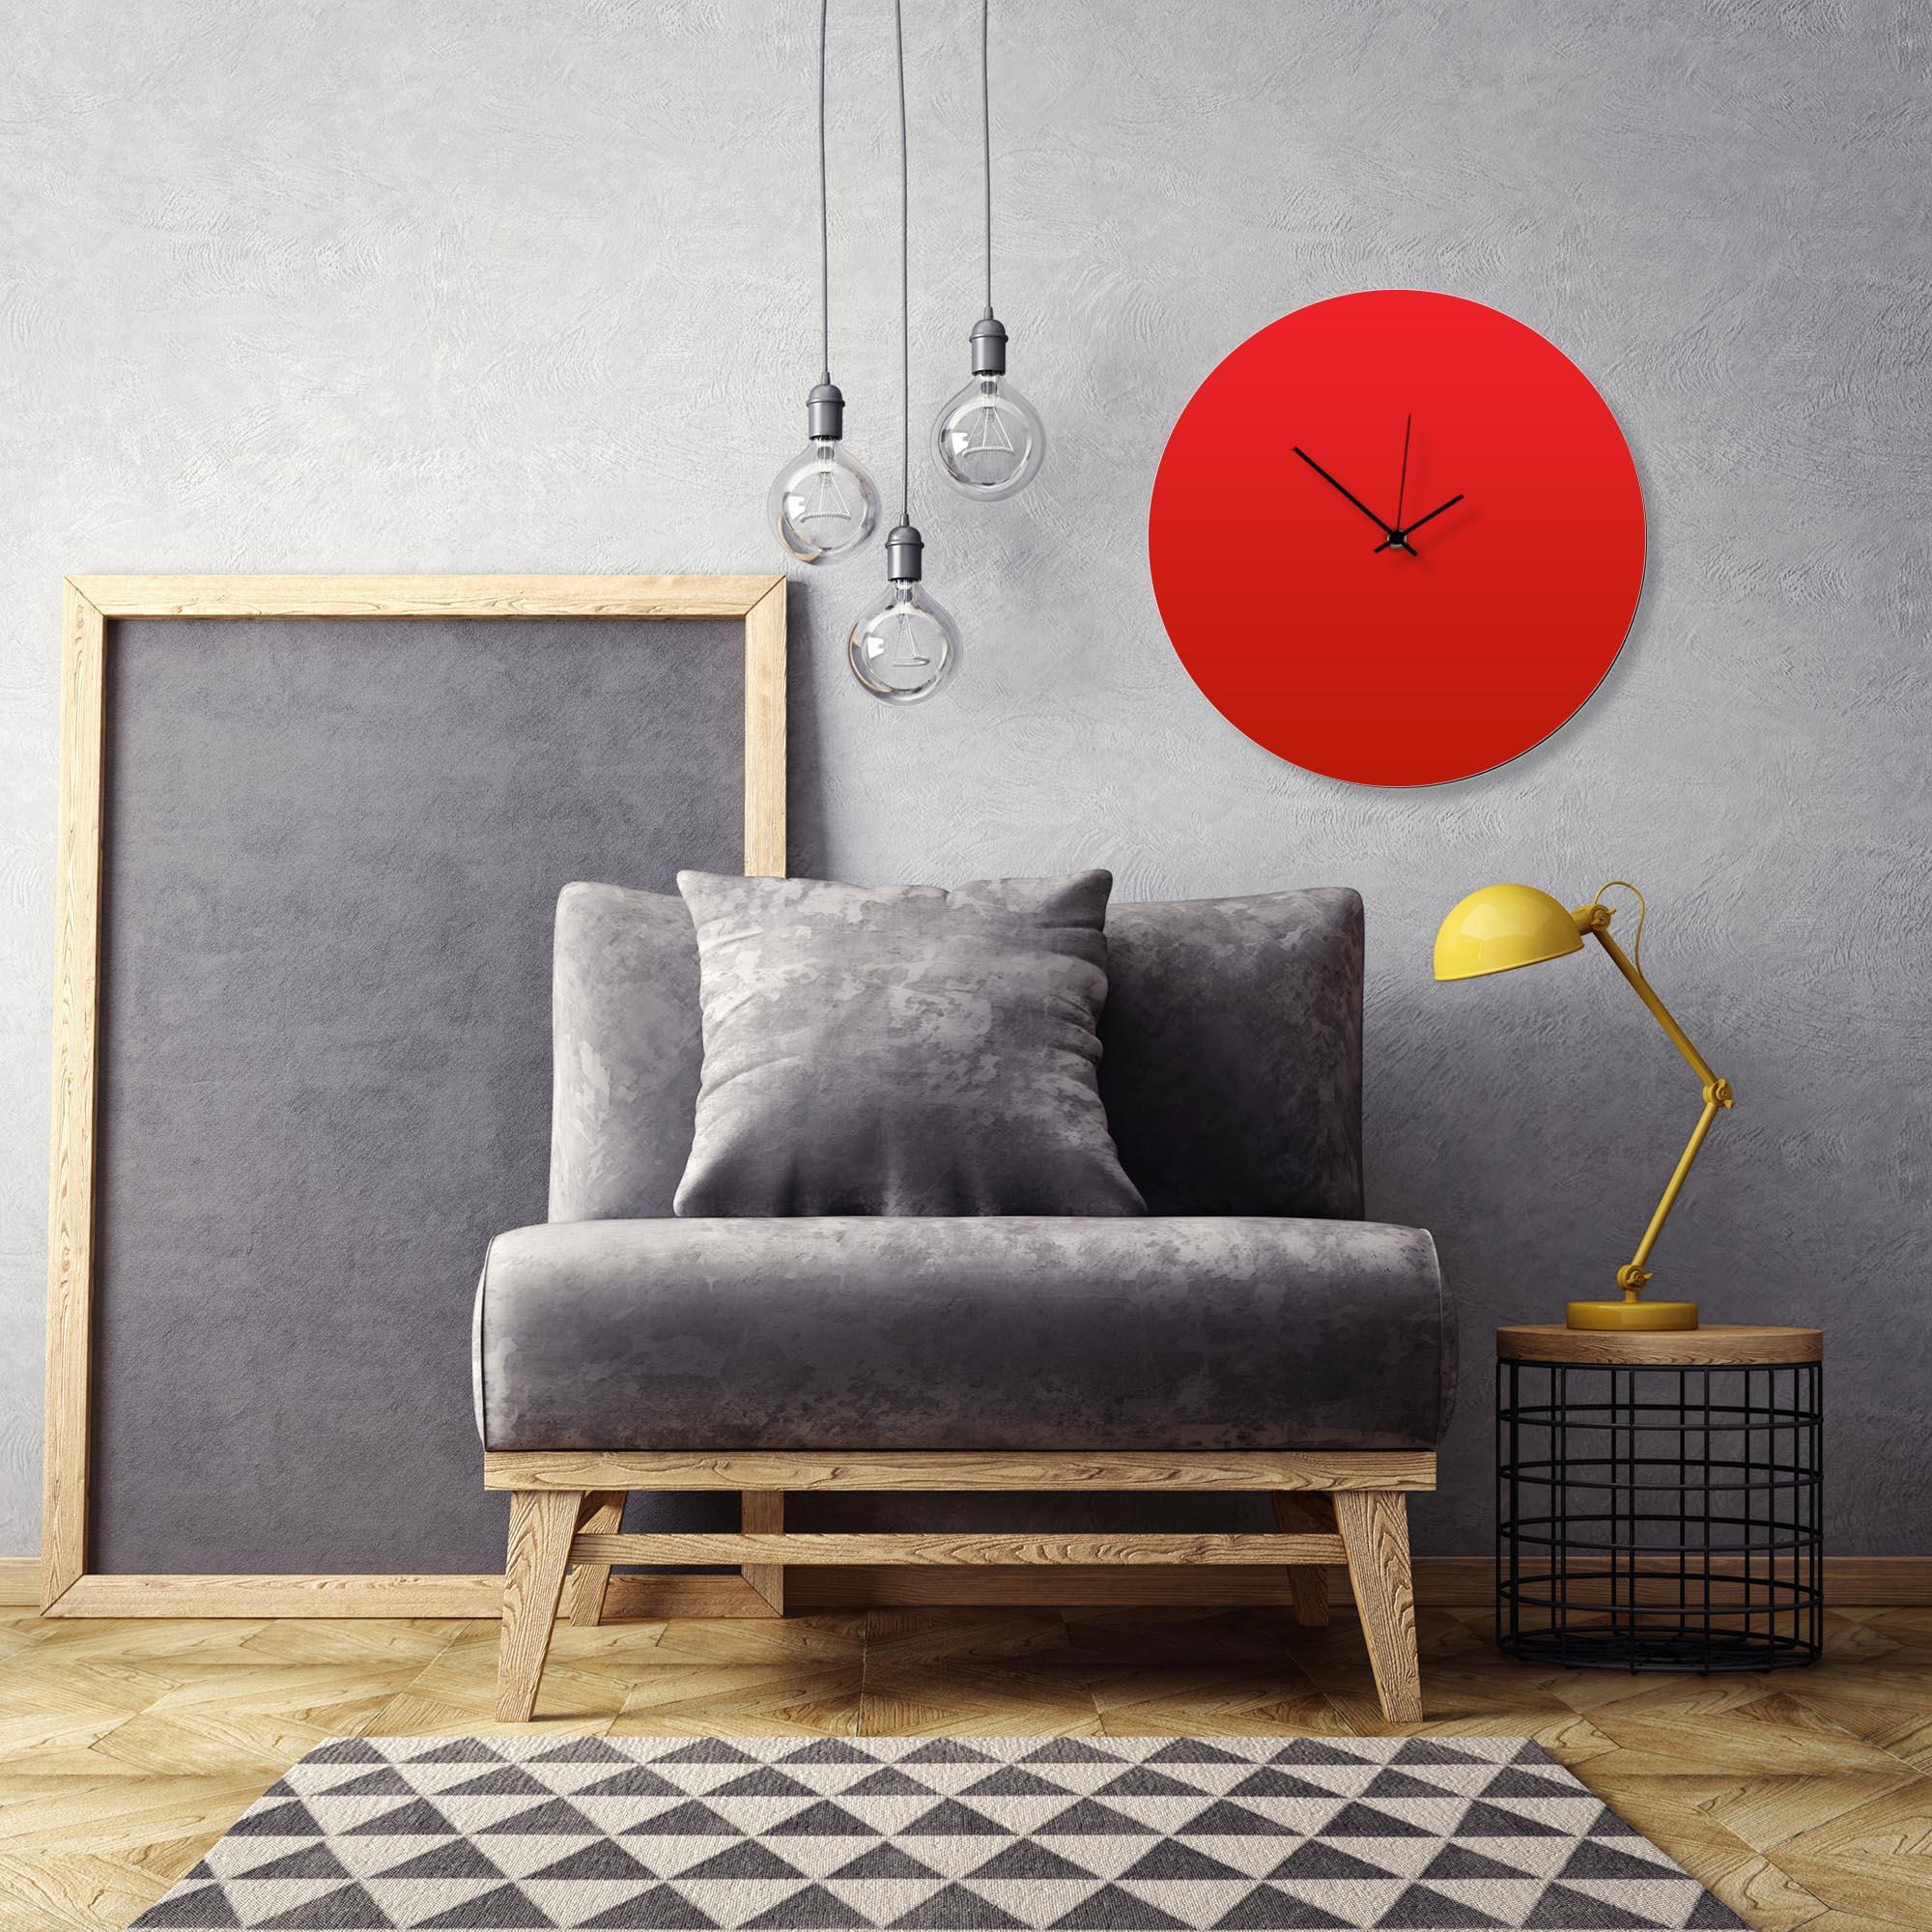 Redout Black Circle Clock Large by Adam Schwoeppe Contemporary Clock on Aluminum Polymetal - Alternate View 1